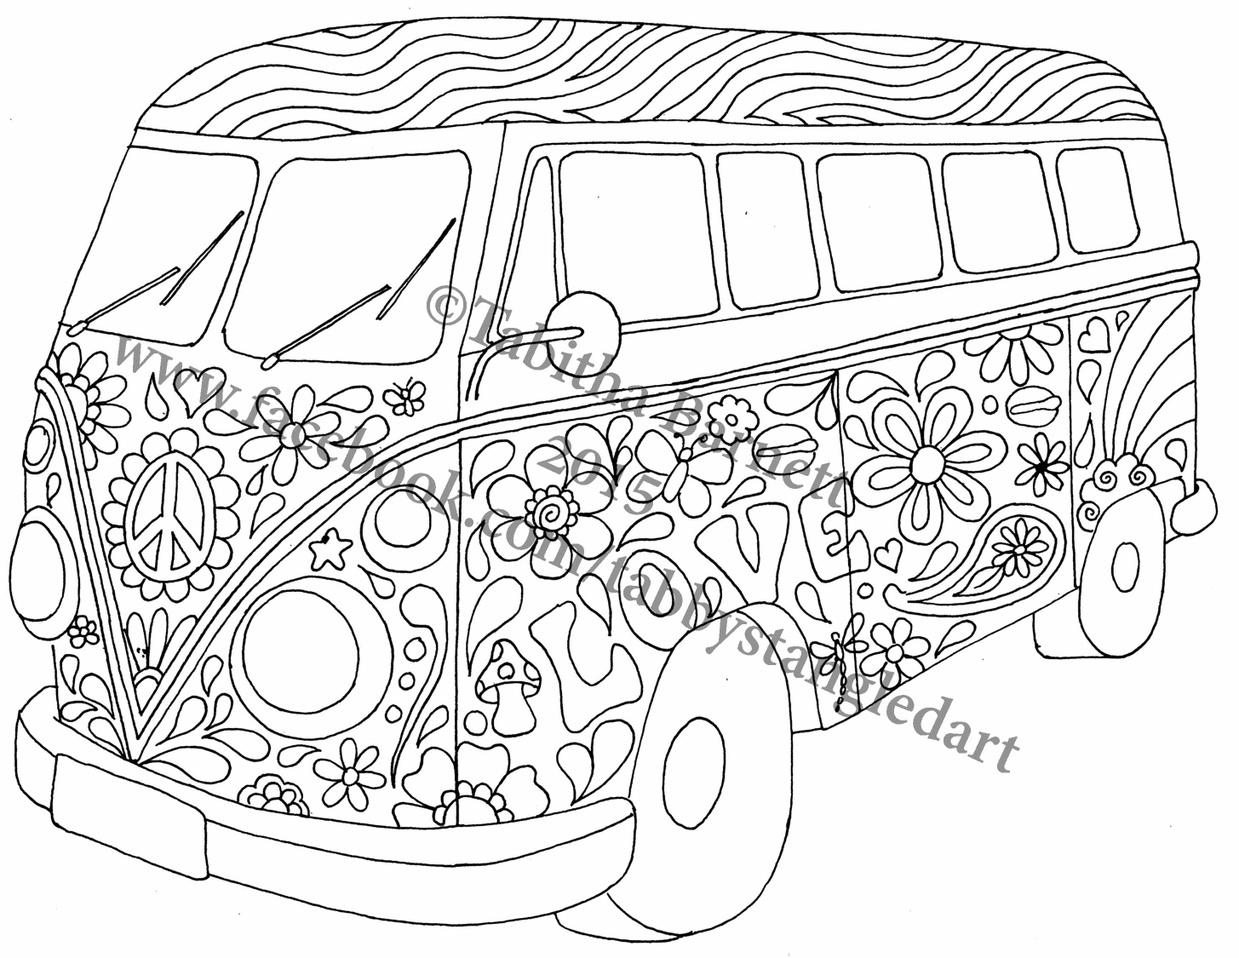 Peace Vw Hippie Van